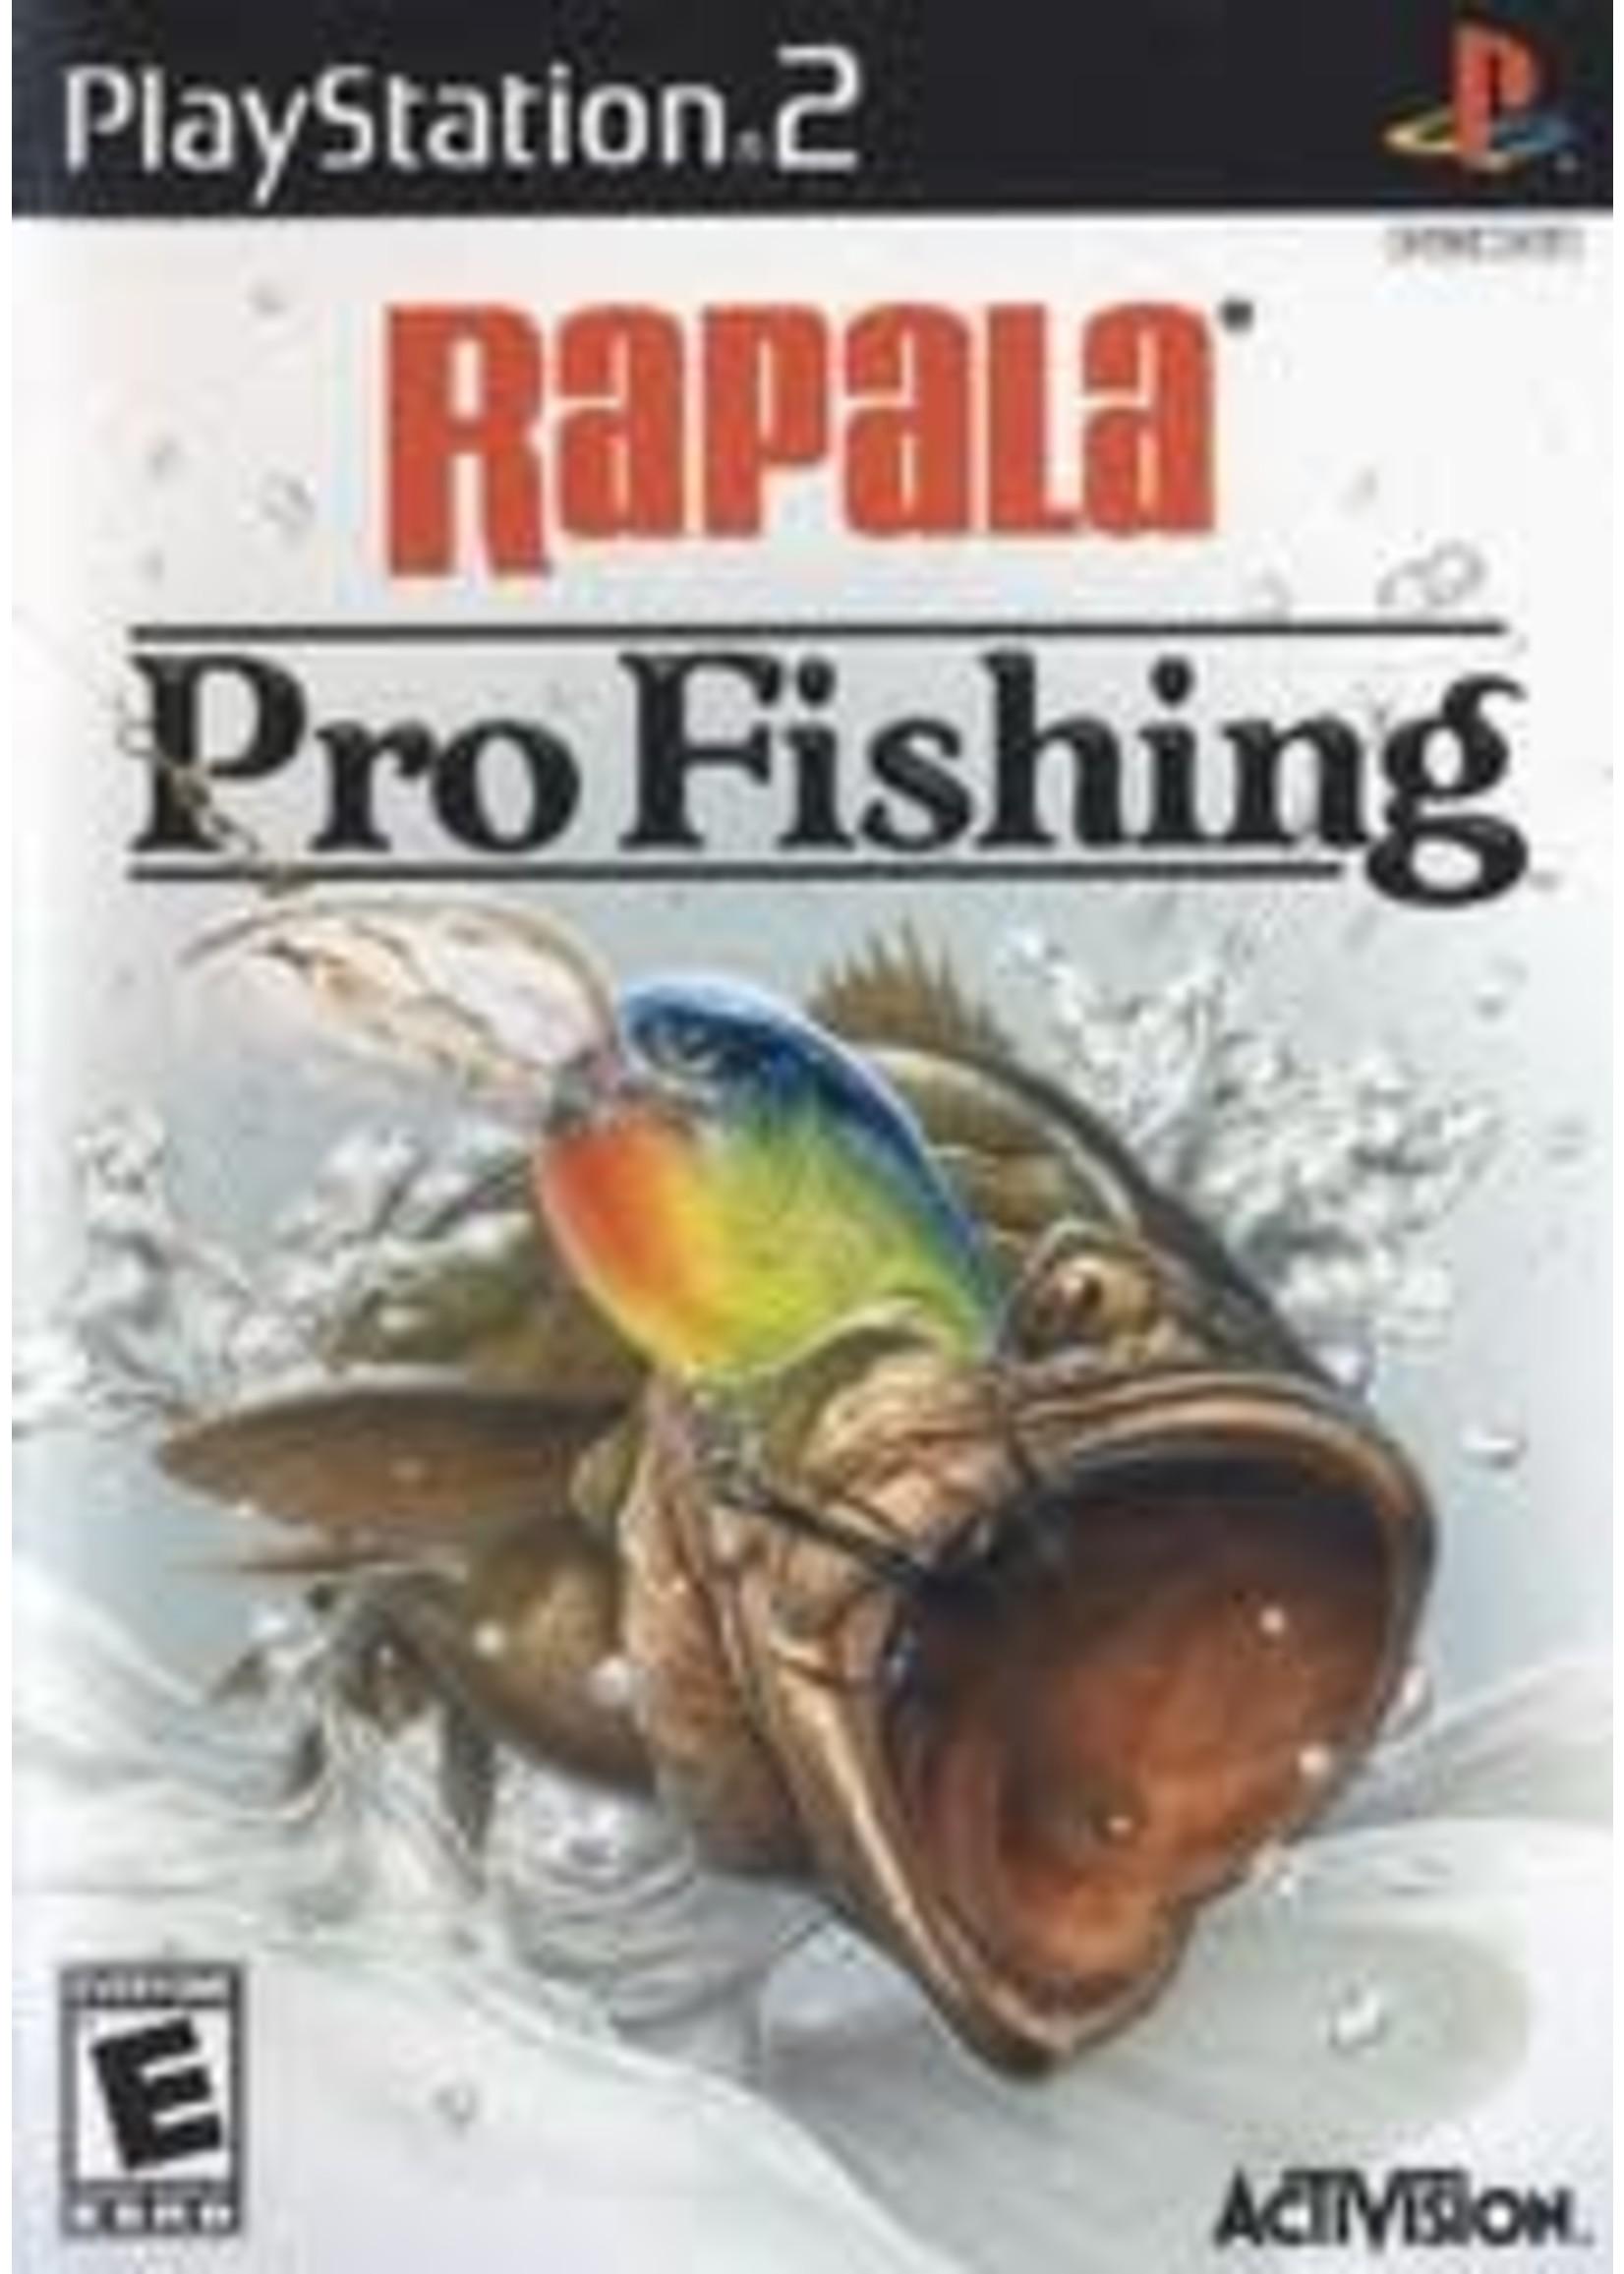 Rapala Pro Fishing Playstation 2